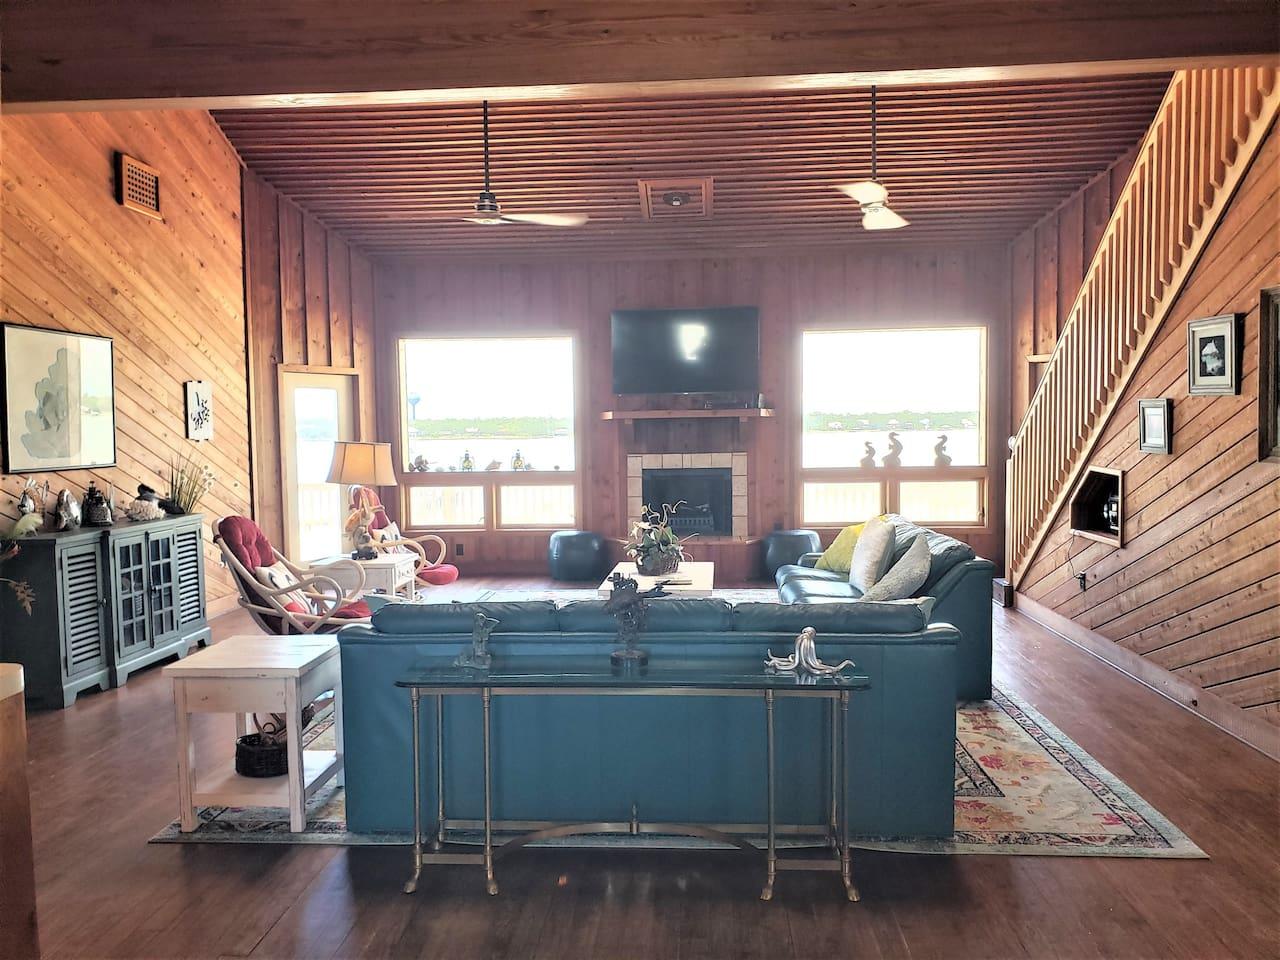 Flooring,Hardwood,Indoors,Room,Living Room